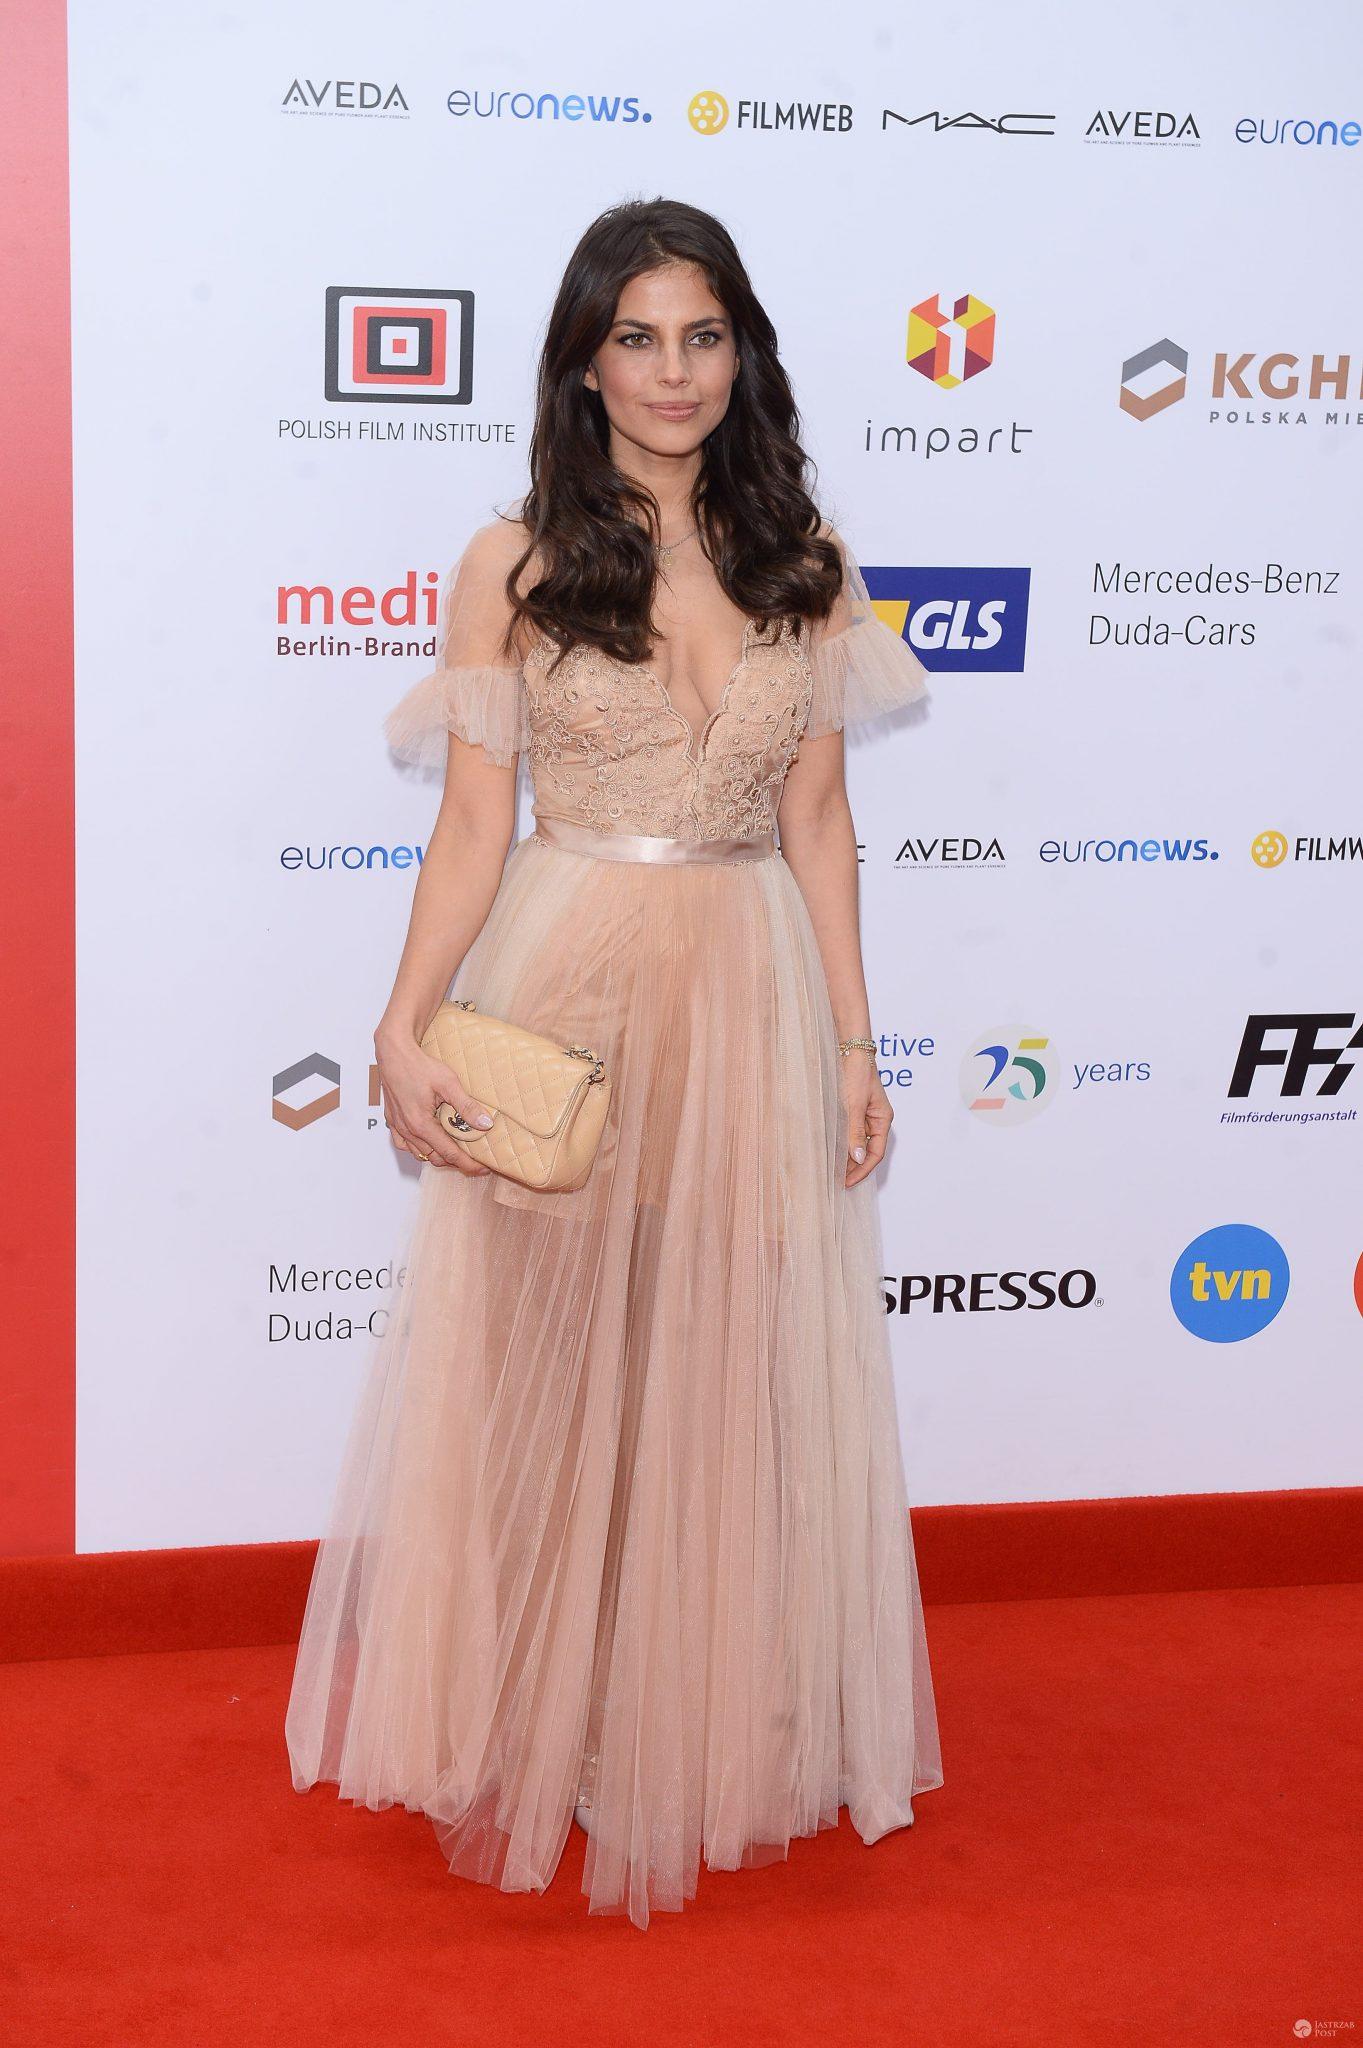 Weronika Rosati - Europejskie Nagrody Filmowe 2016